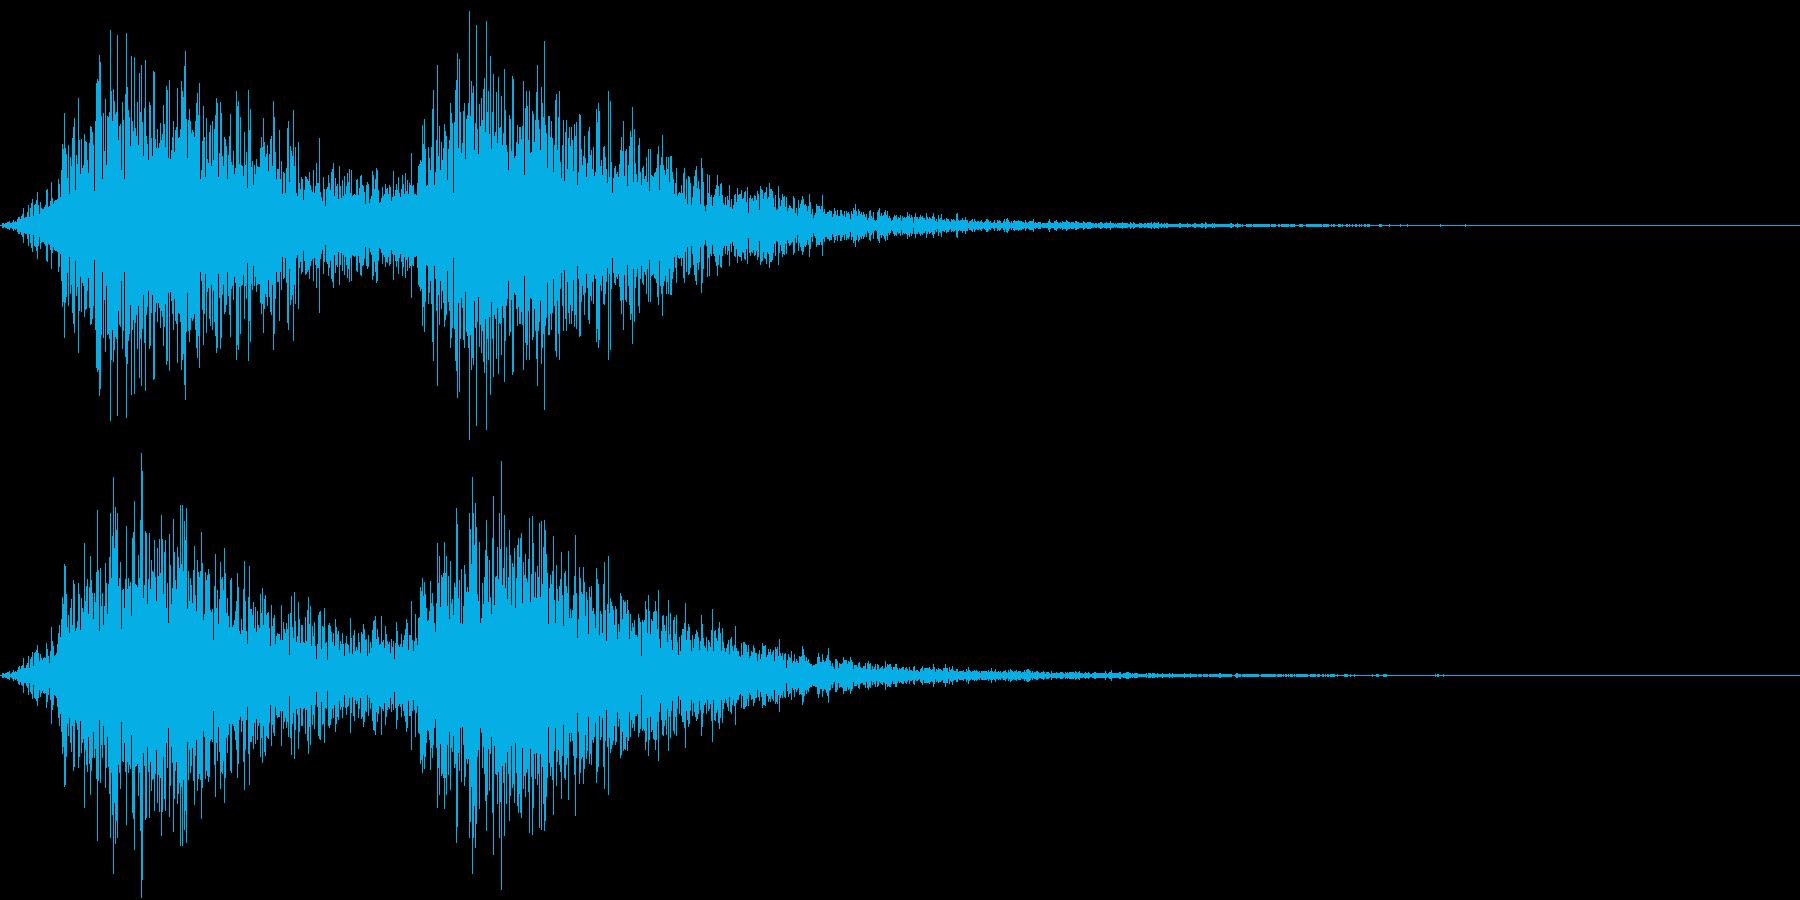 Battle 戦闘エフェクト音 2の再生済みの波形